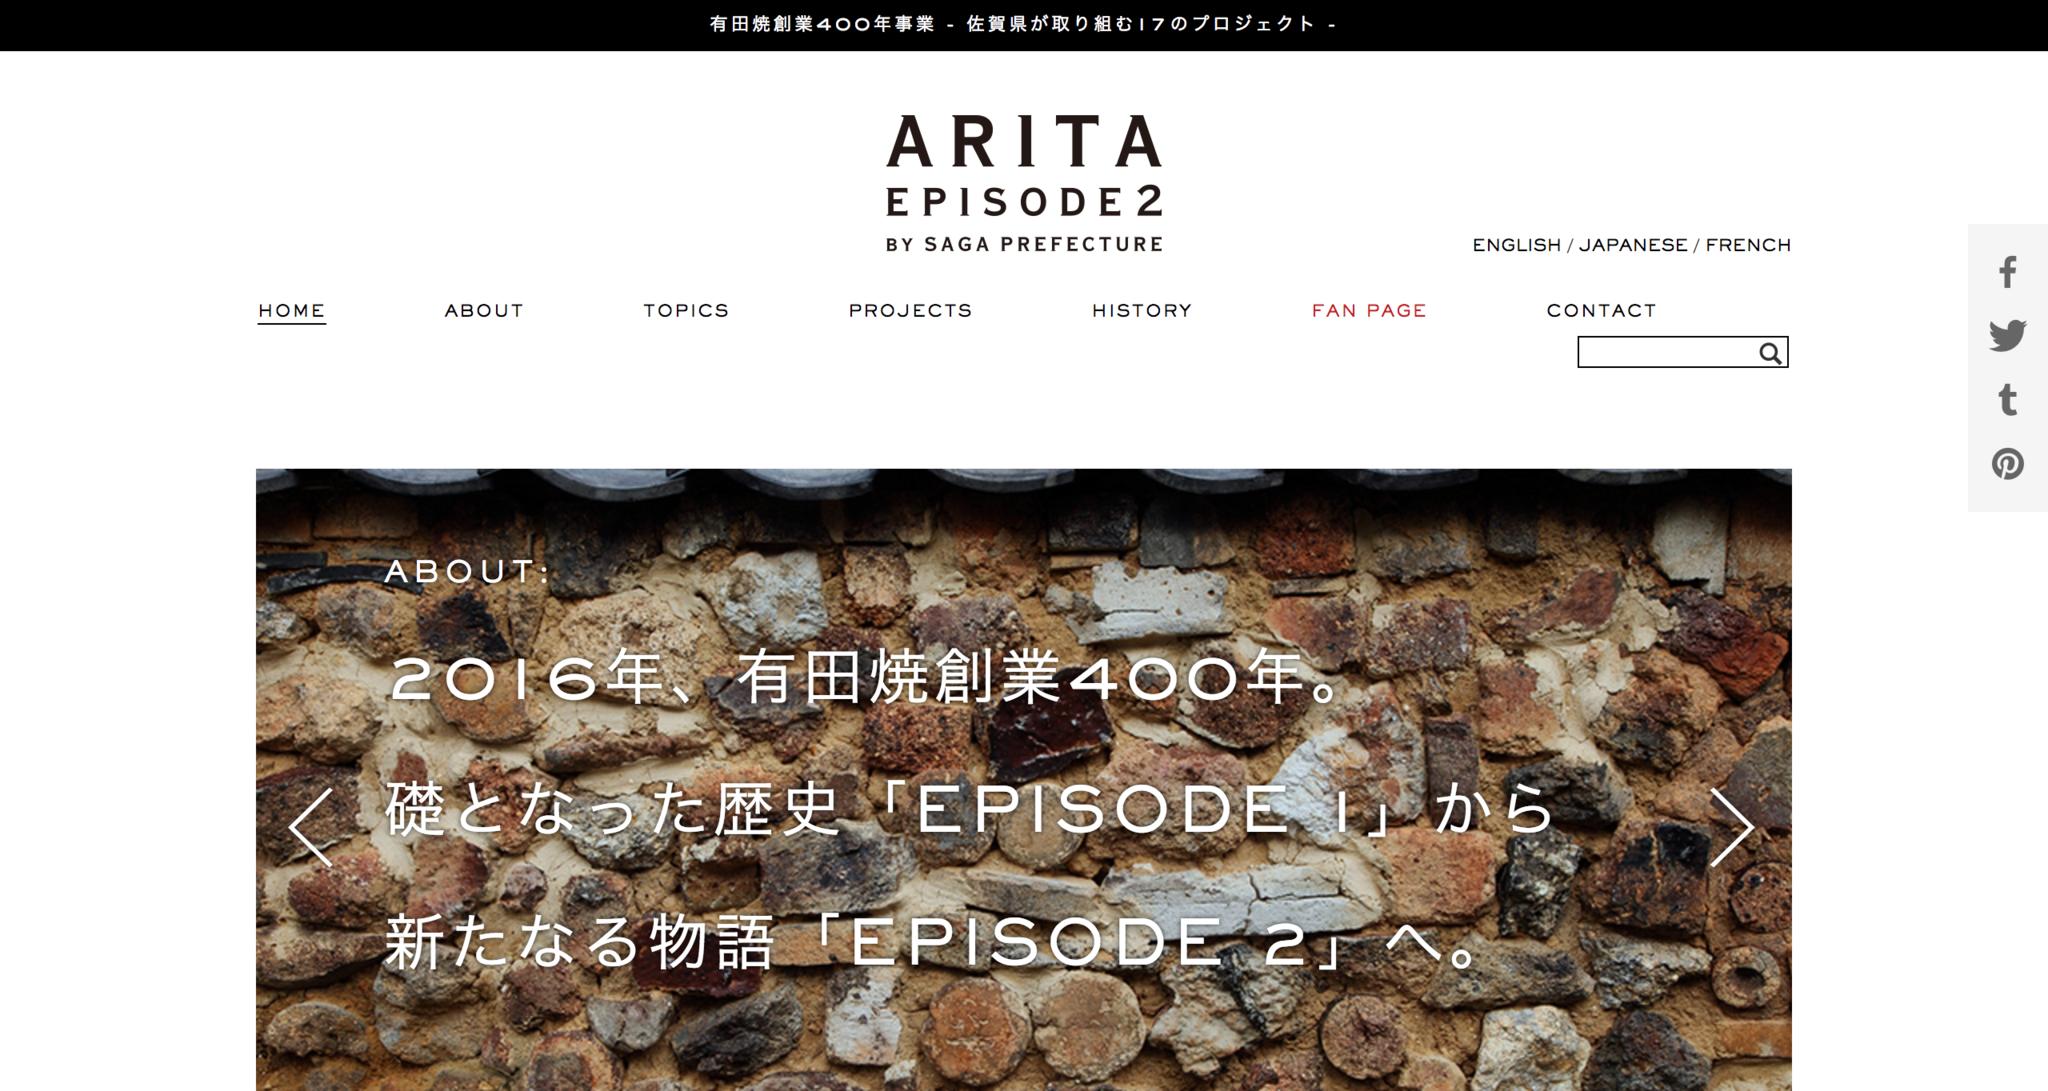 ARITA_EPISODE_2___有田焼400年_新しい時代のはじまり__.png